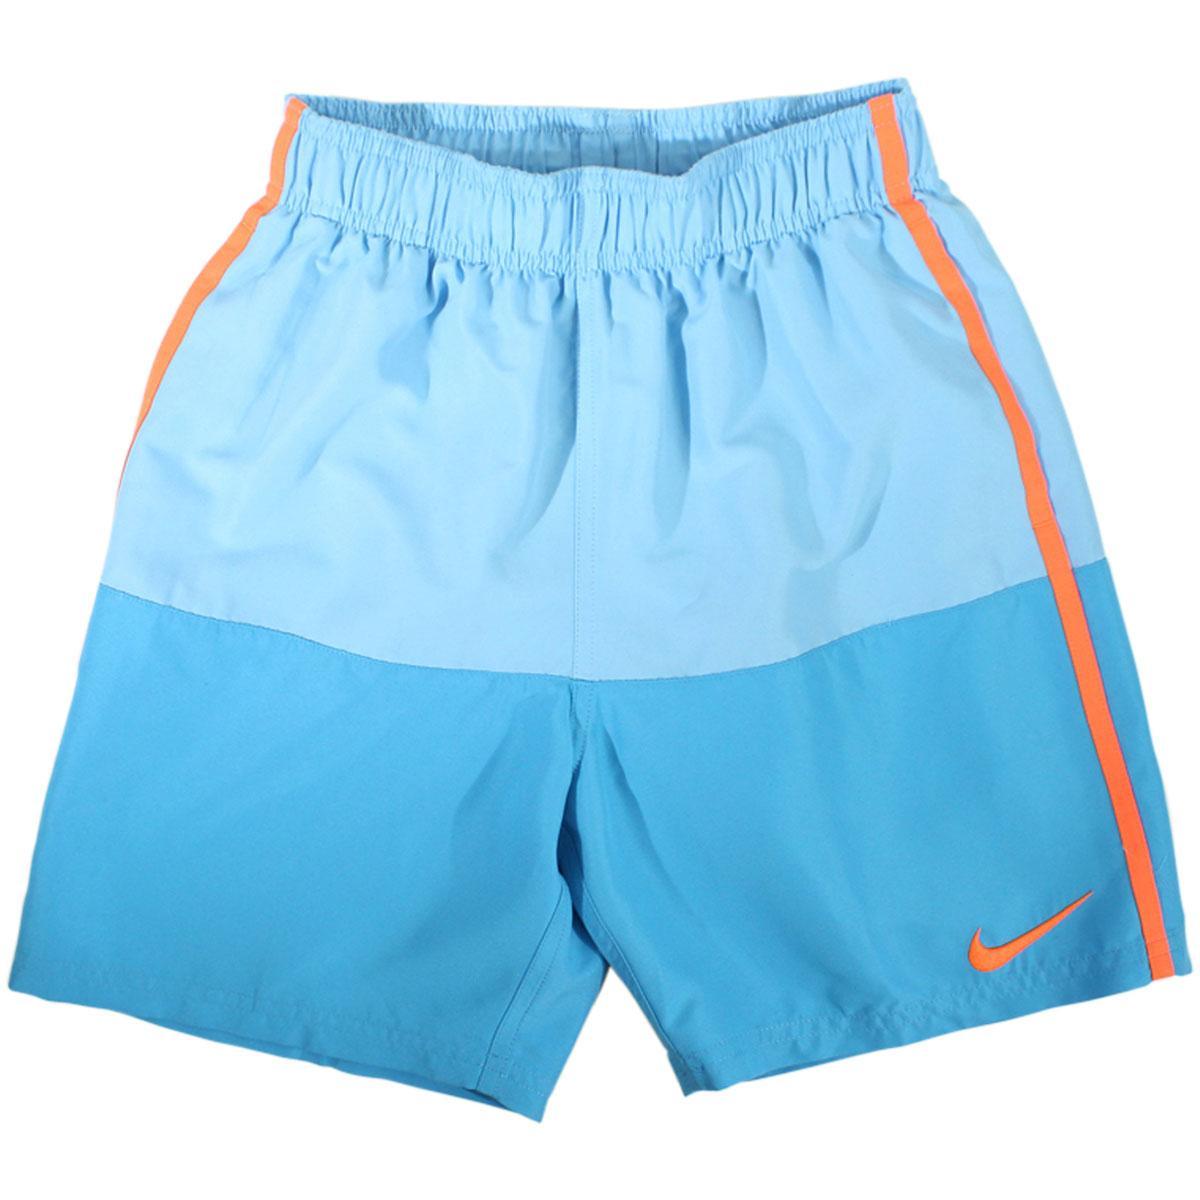 Nike Big Boy's Solid Split 6-Inch Trunks Swimwear